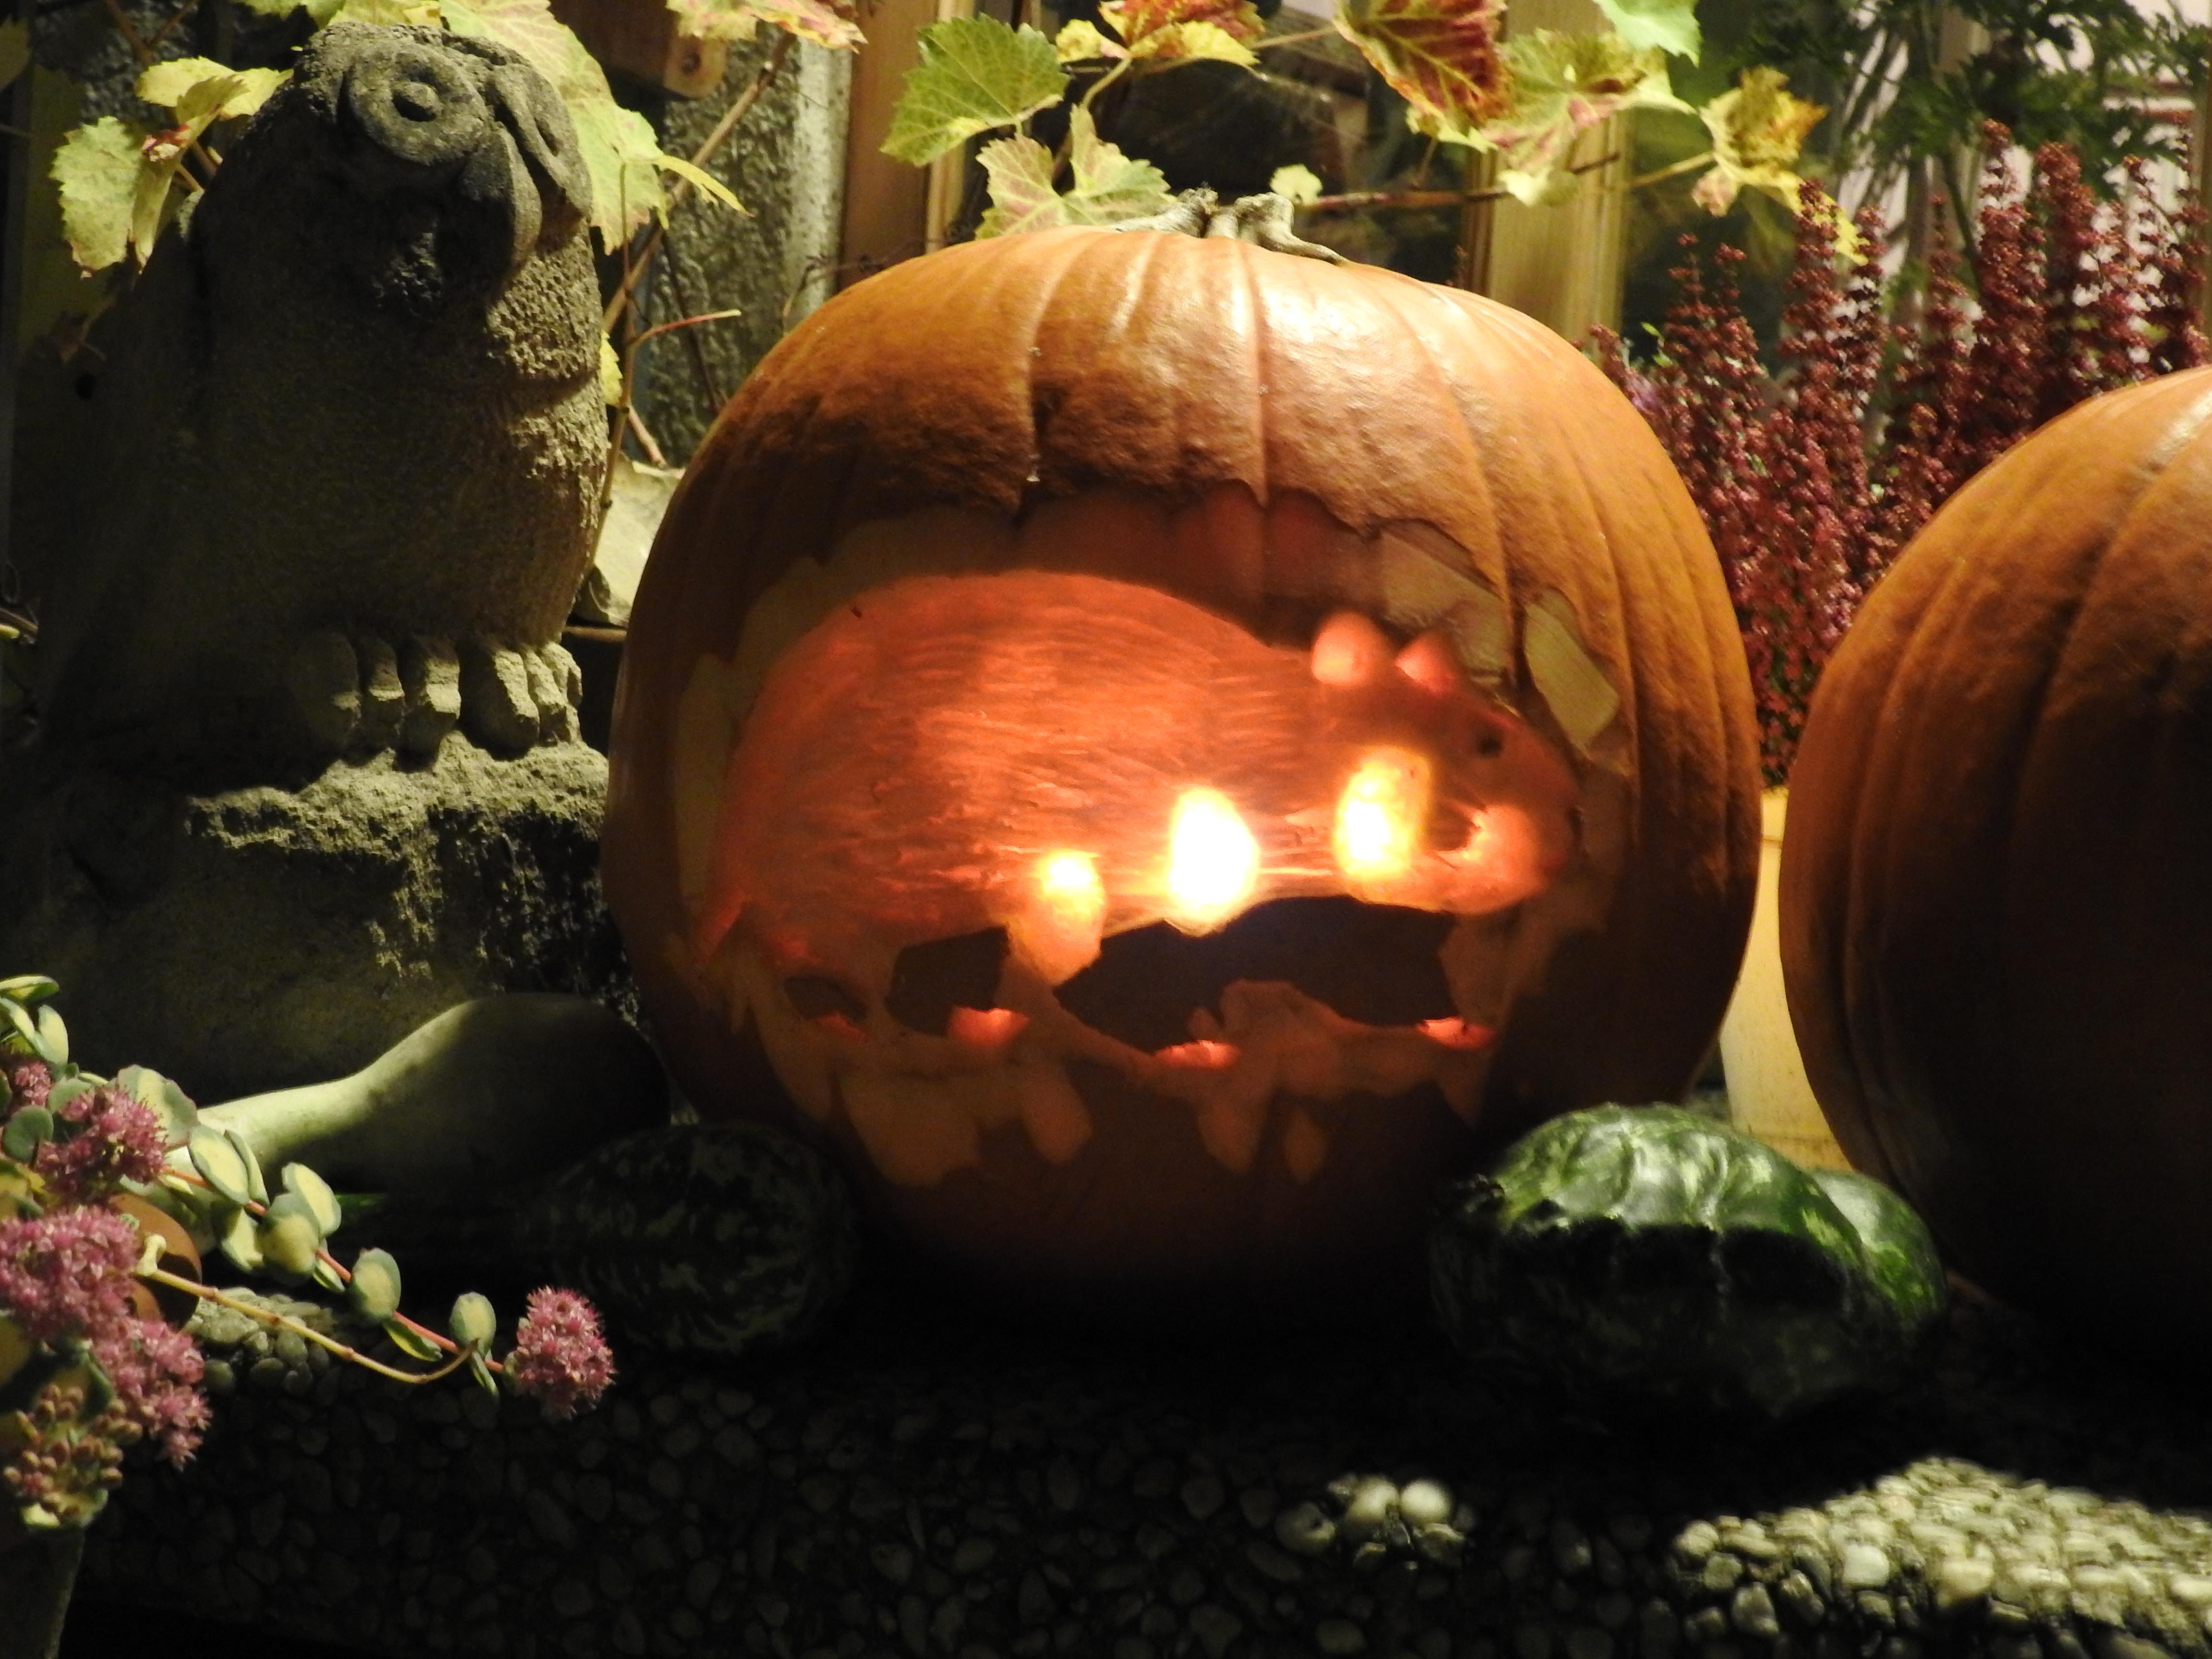 Halloweenkürbis mit Feldhamster